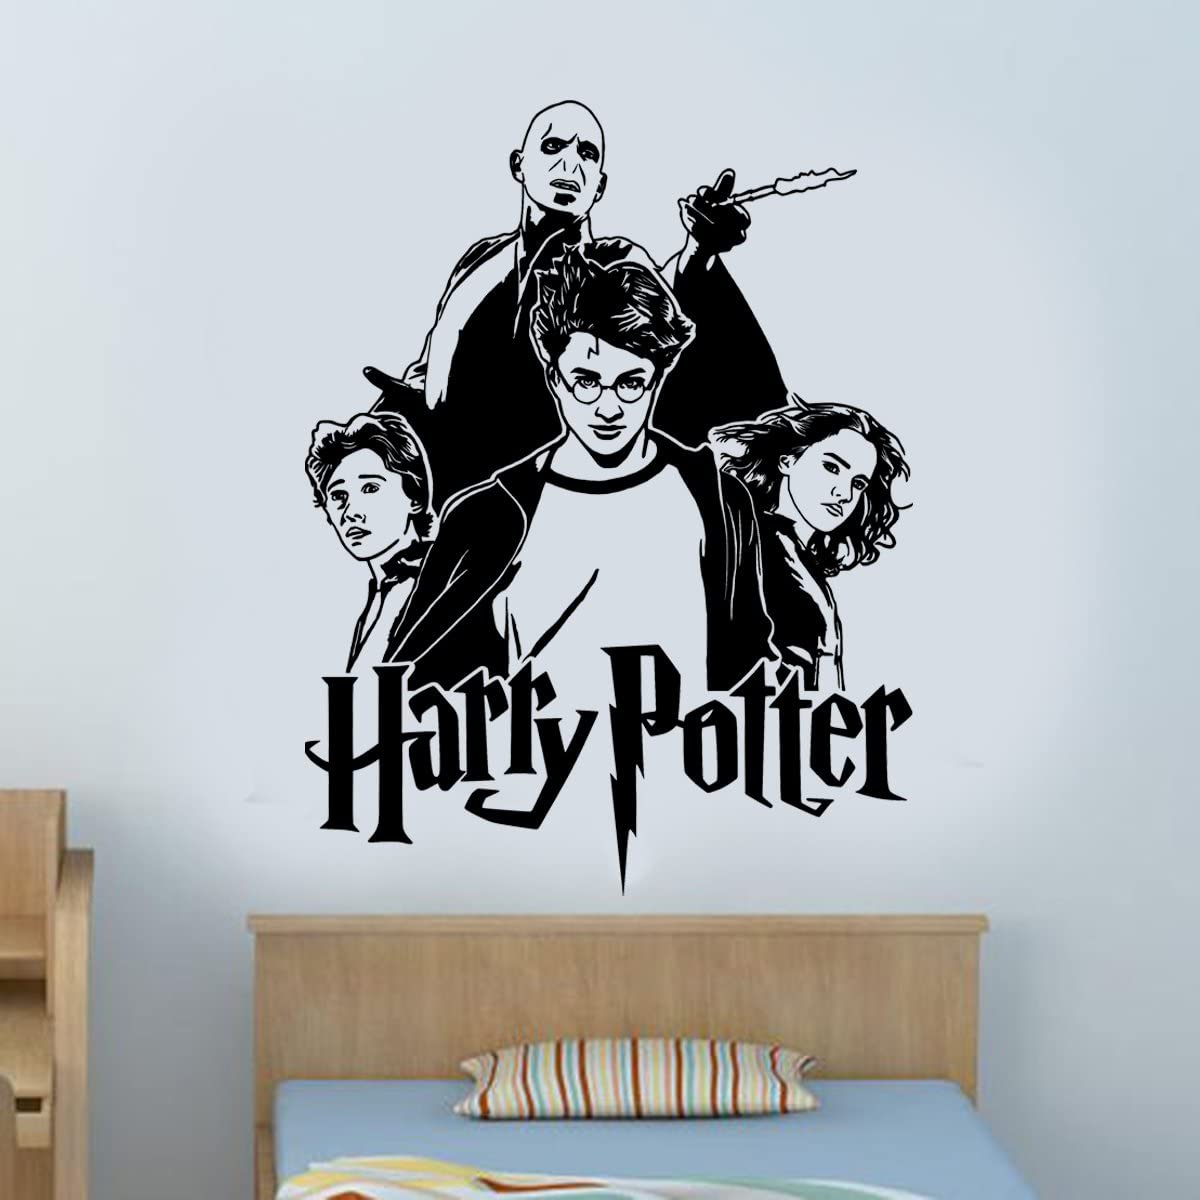 Harry Potter Hermione Granger Ron Weasley Voldemort - Adhesivo decorativo para pared para niños